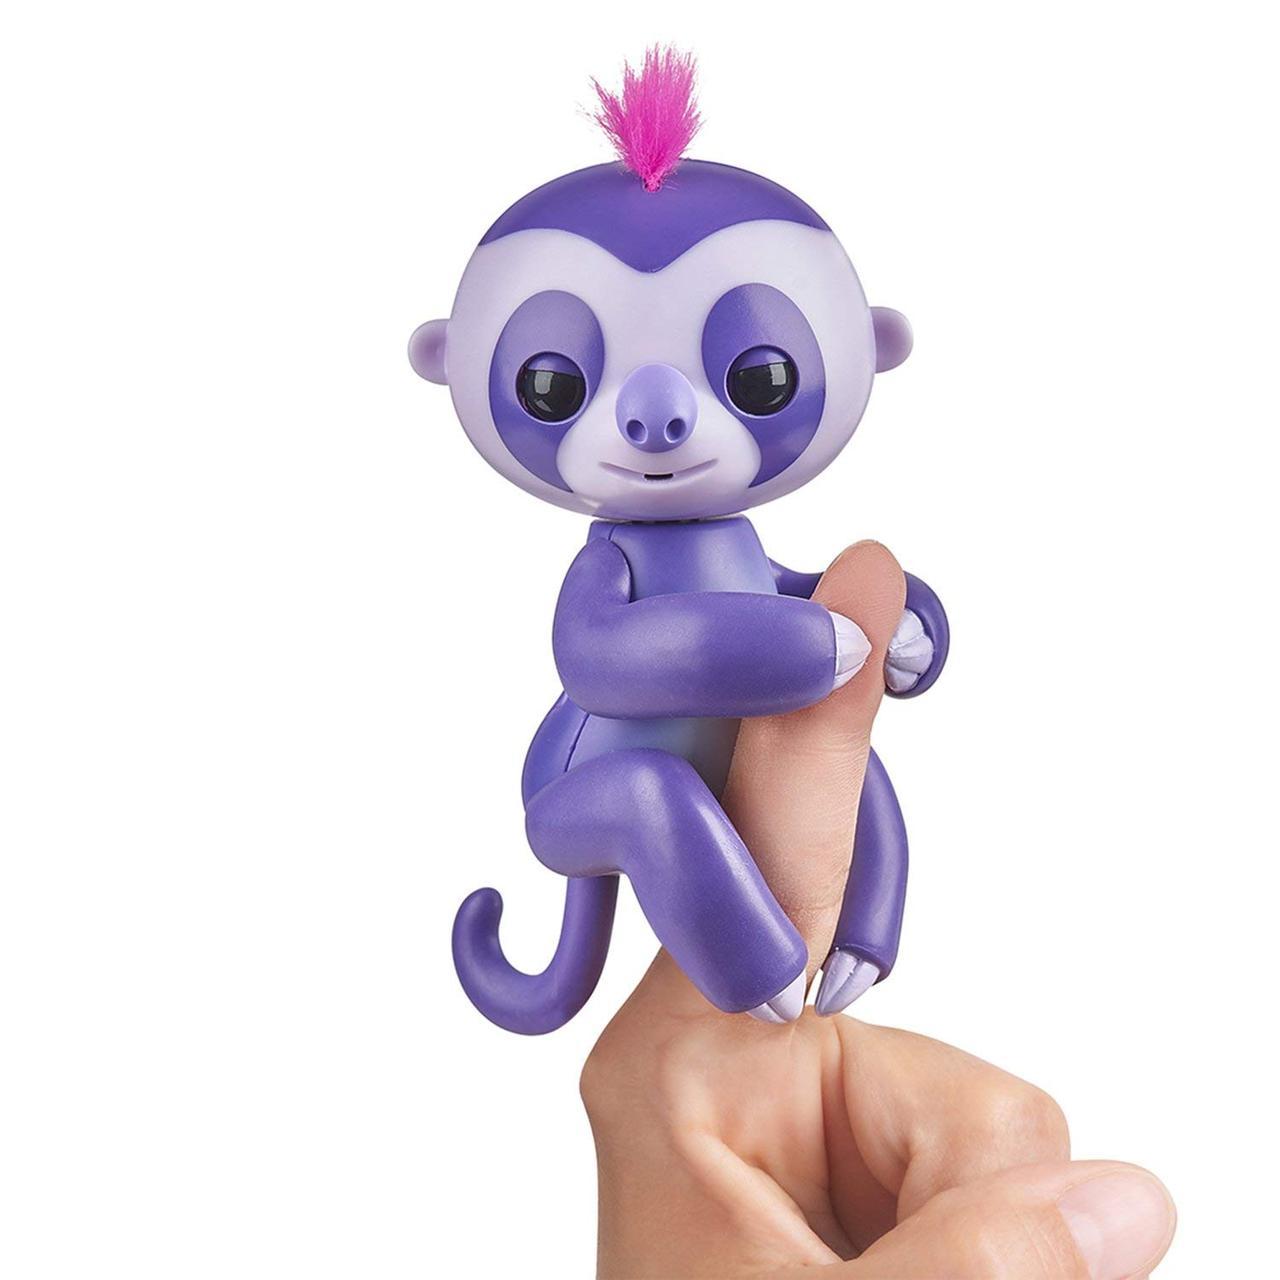 Интерактивный ленивец Fingerlings, фиолетовый - Марж. Fingerlings Baby Sloth - Marge (3750/3752), 5+